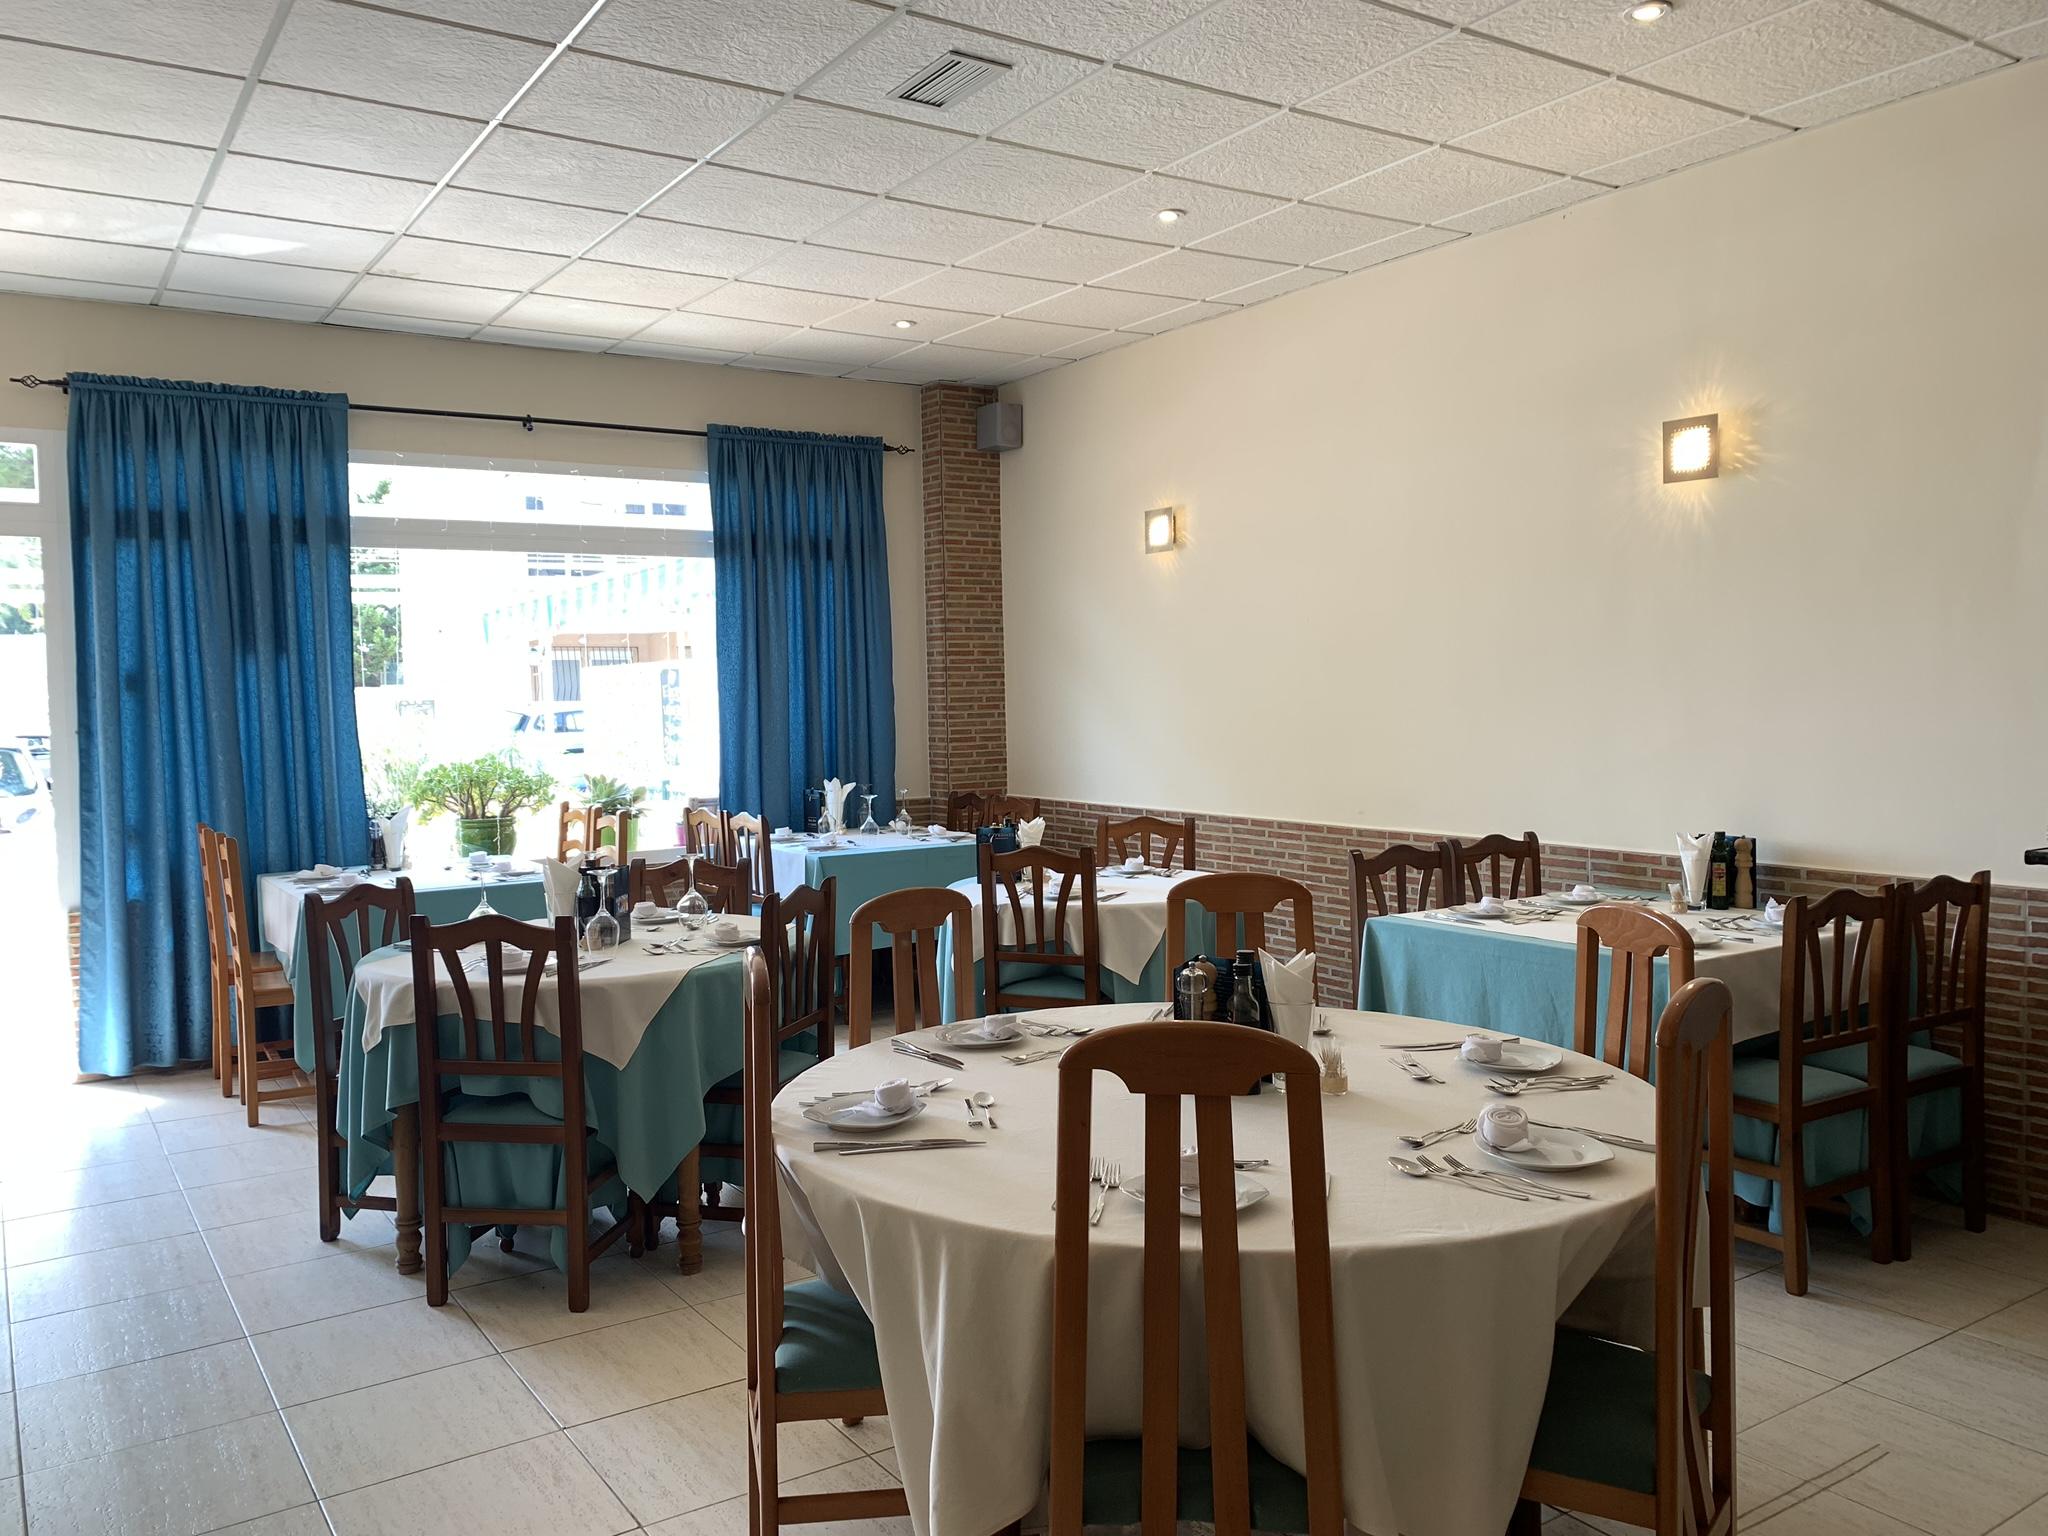 Se traspasa bar-restaurante a tan solo 200 metros de la playa La Zenia